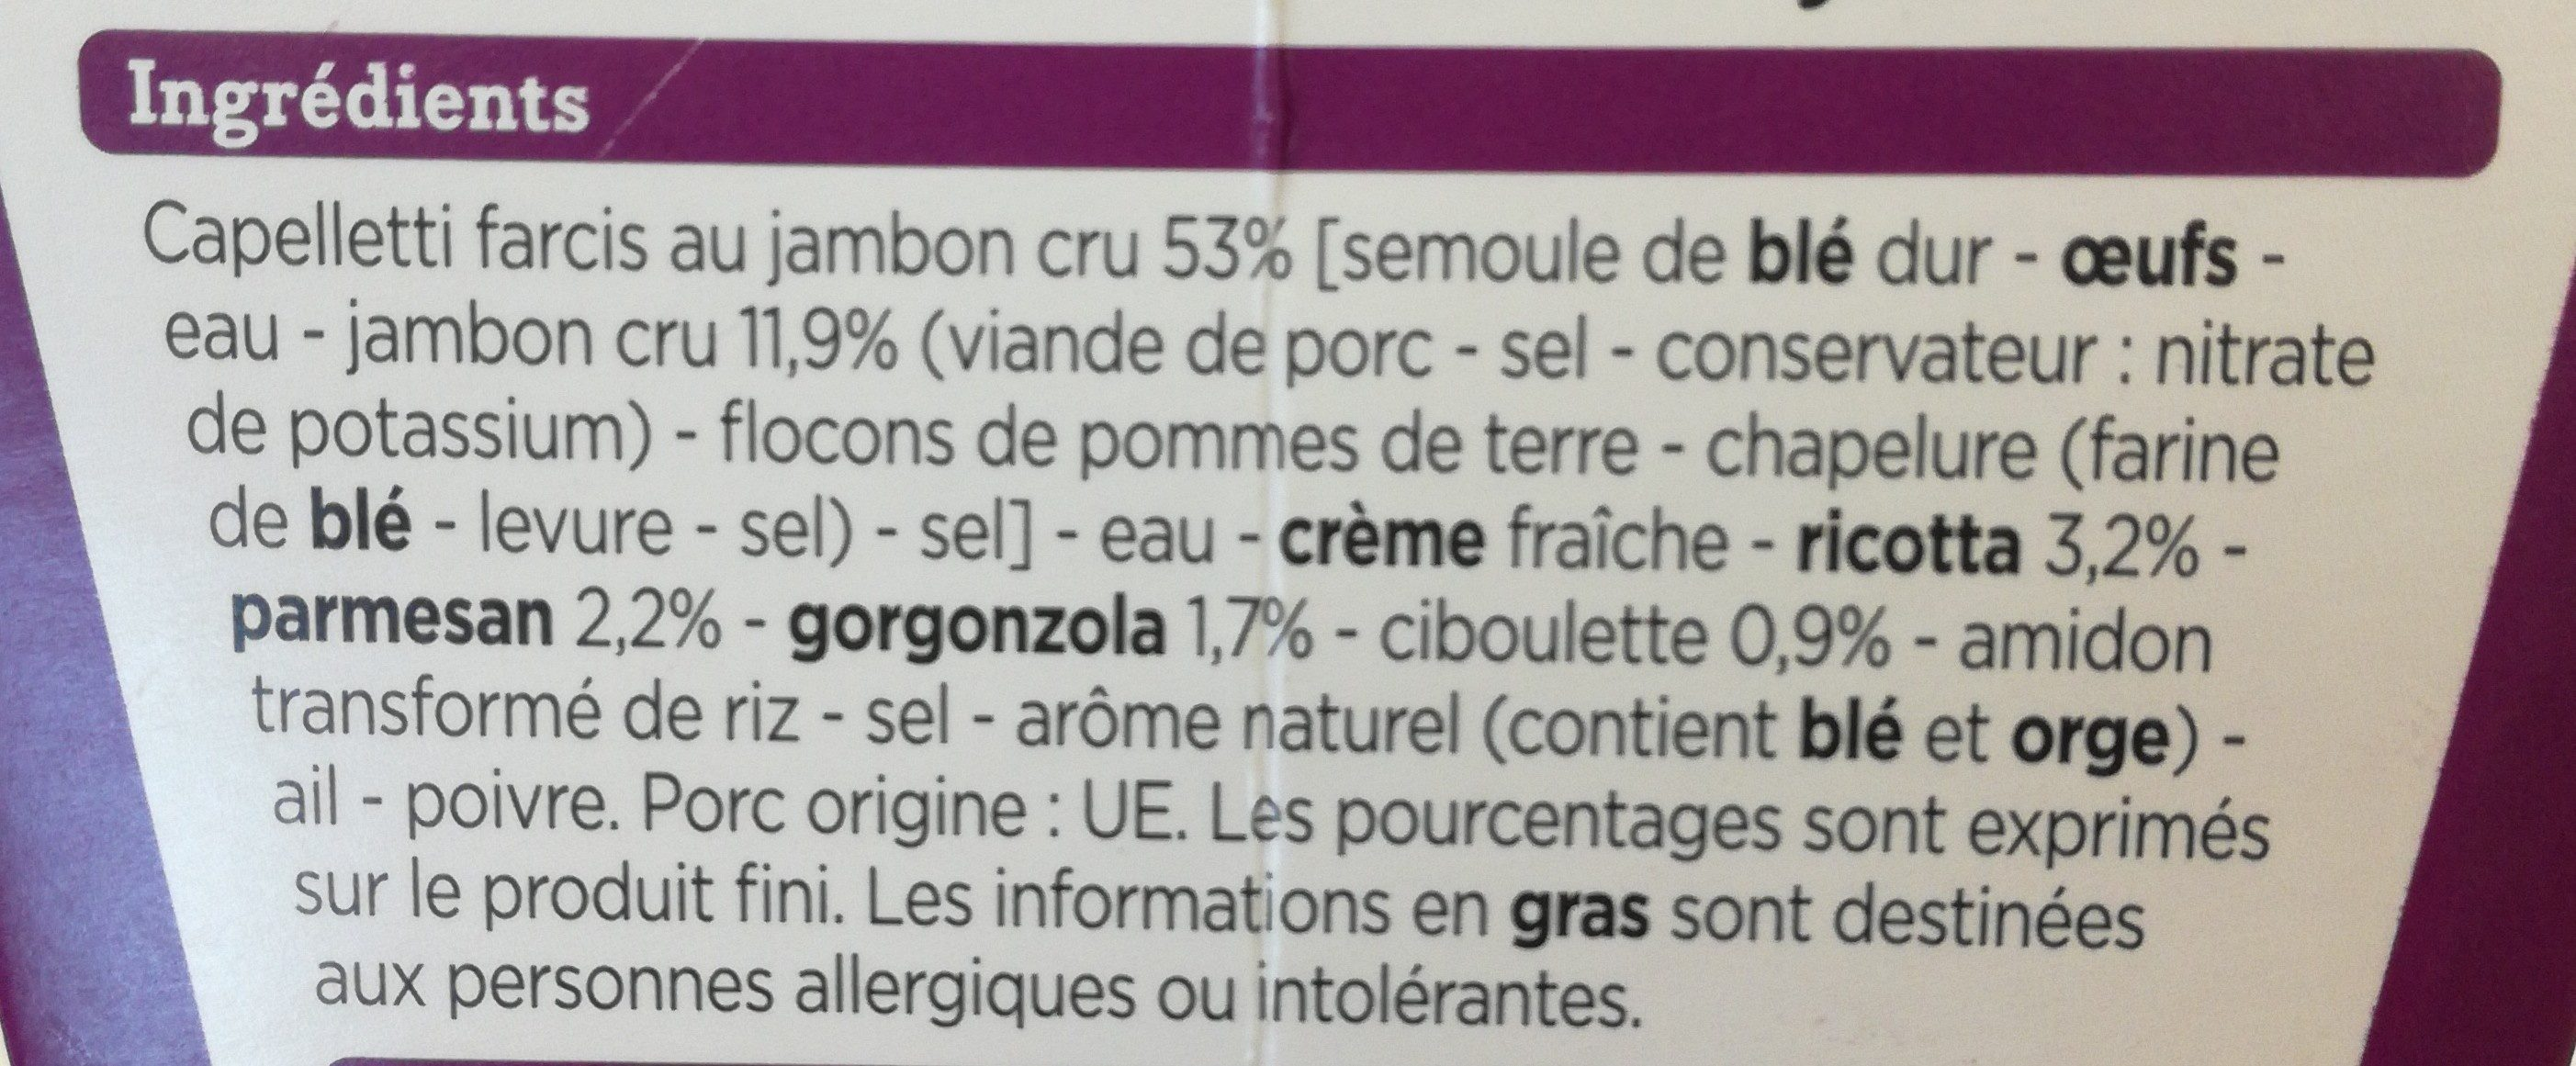 Capelletti jambon sauce 3 fromages - Ingrédients - fr